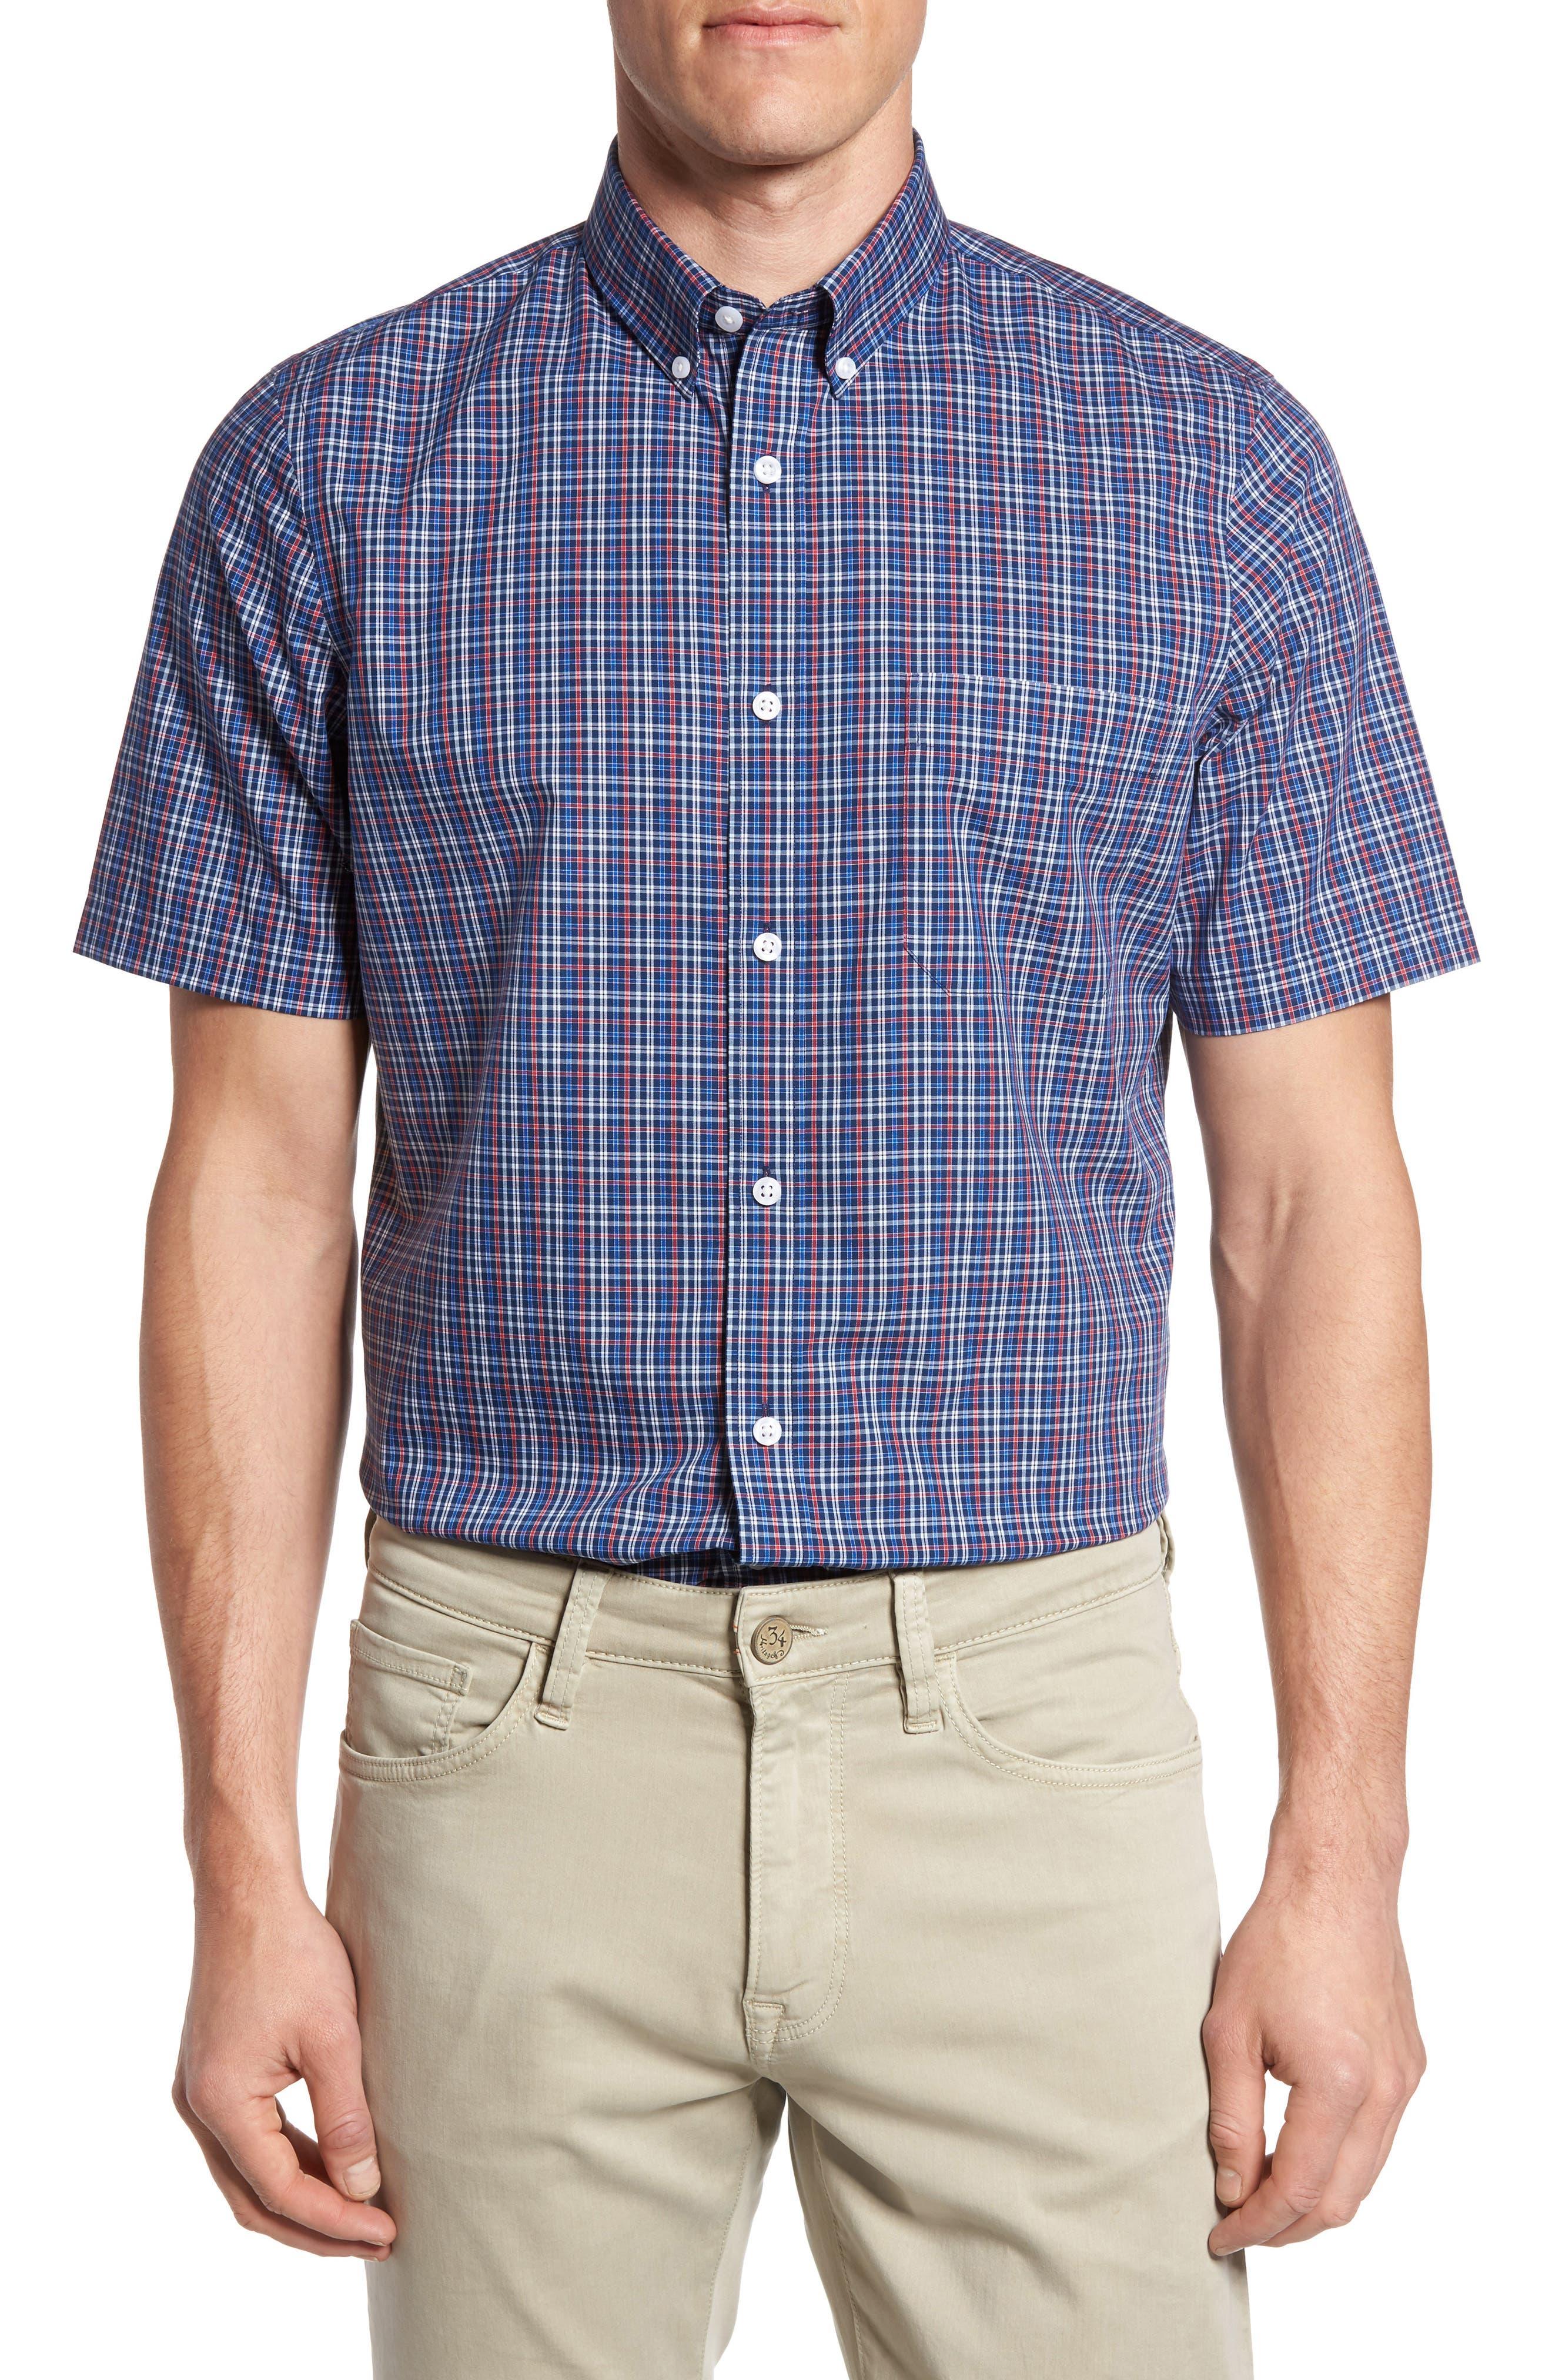 NORDSTROM MENS SHOP Smartcare<sup>™</sup> Regular Fit Check Sport Shirt